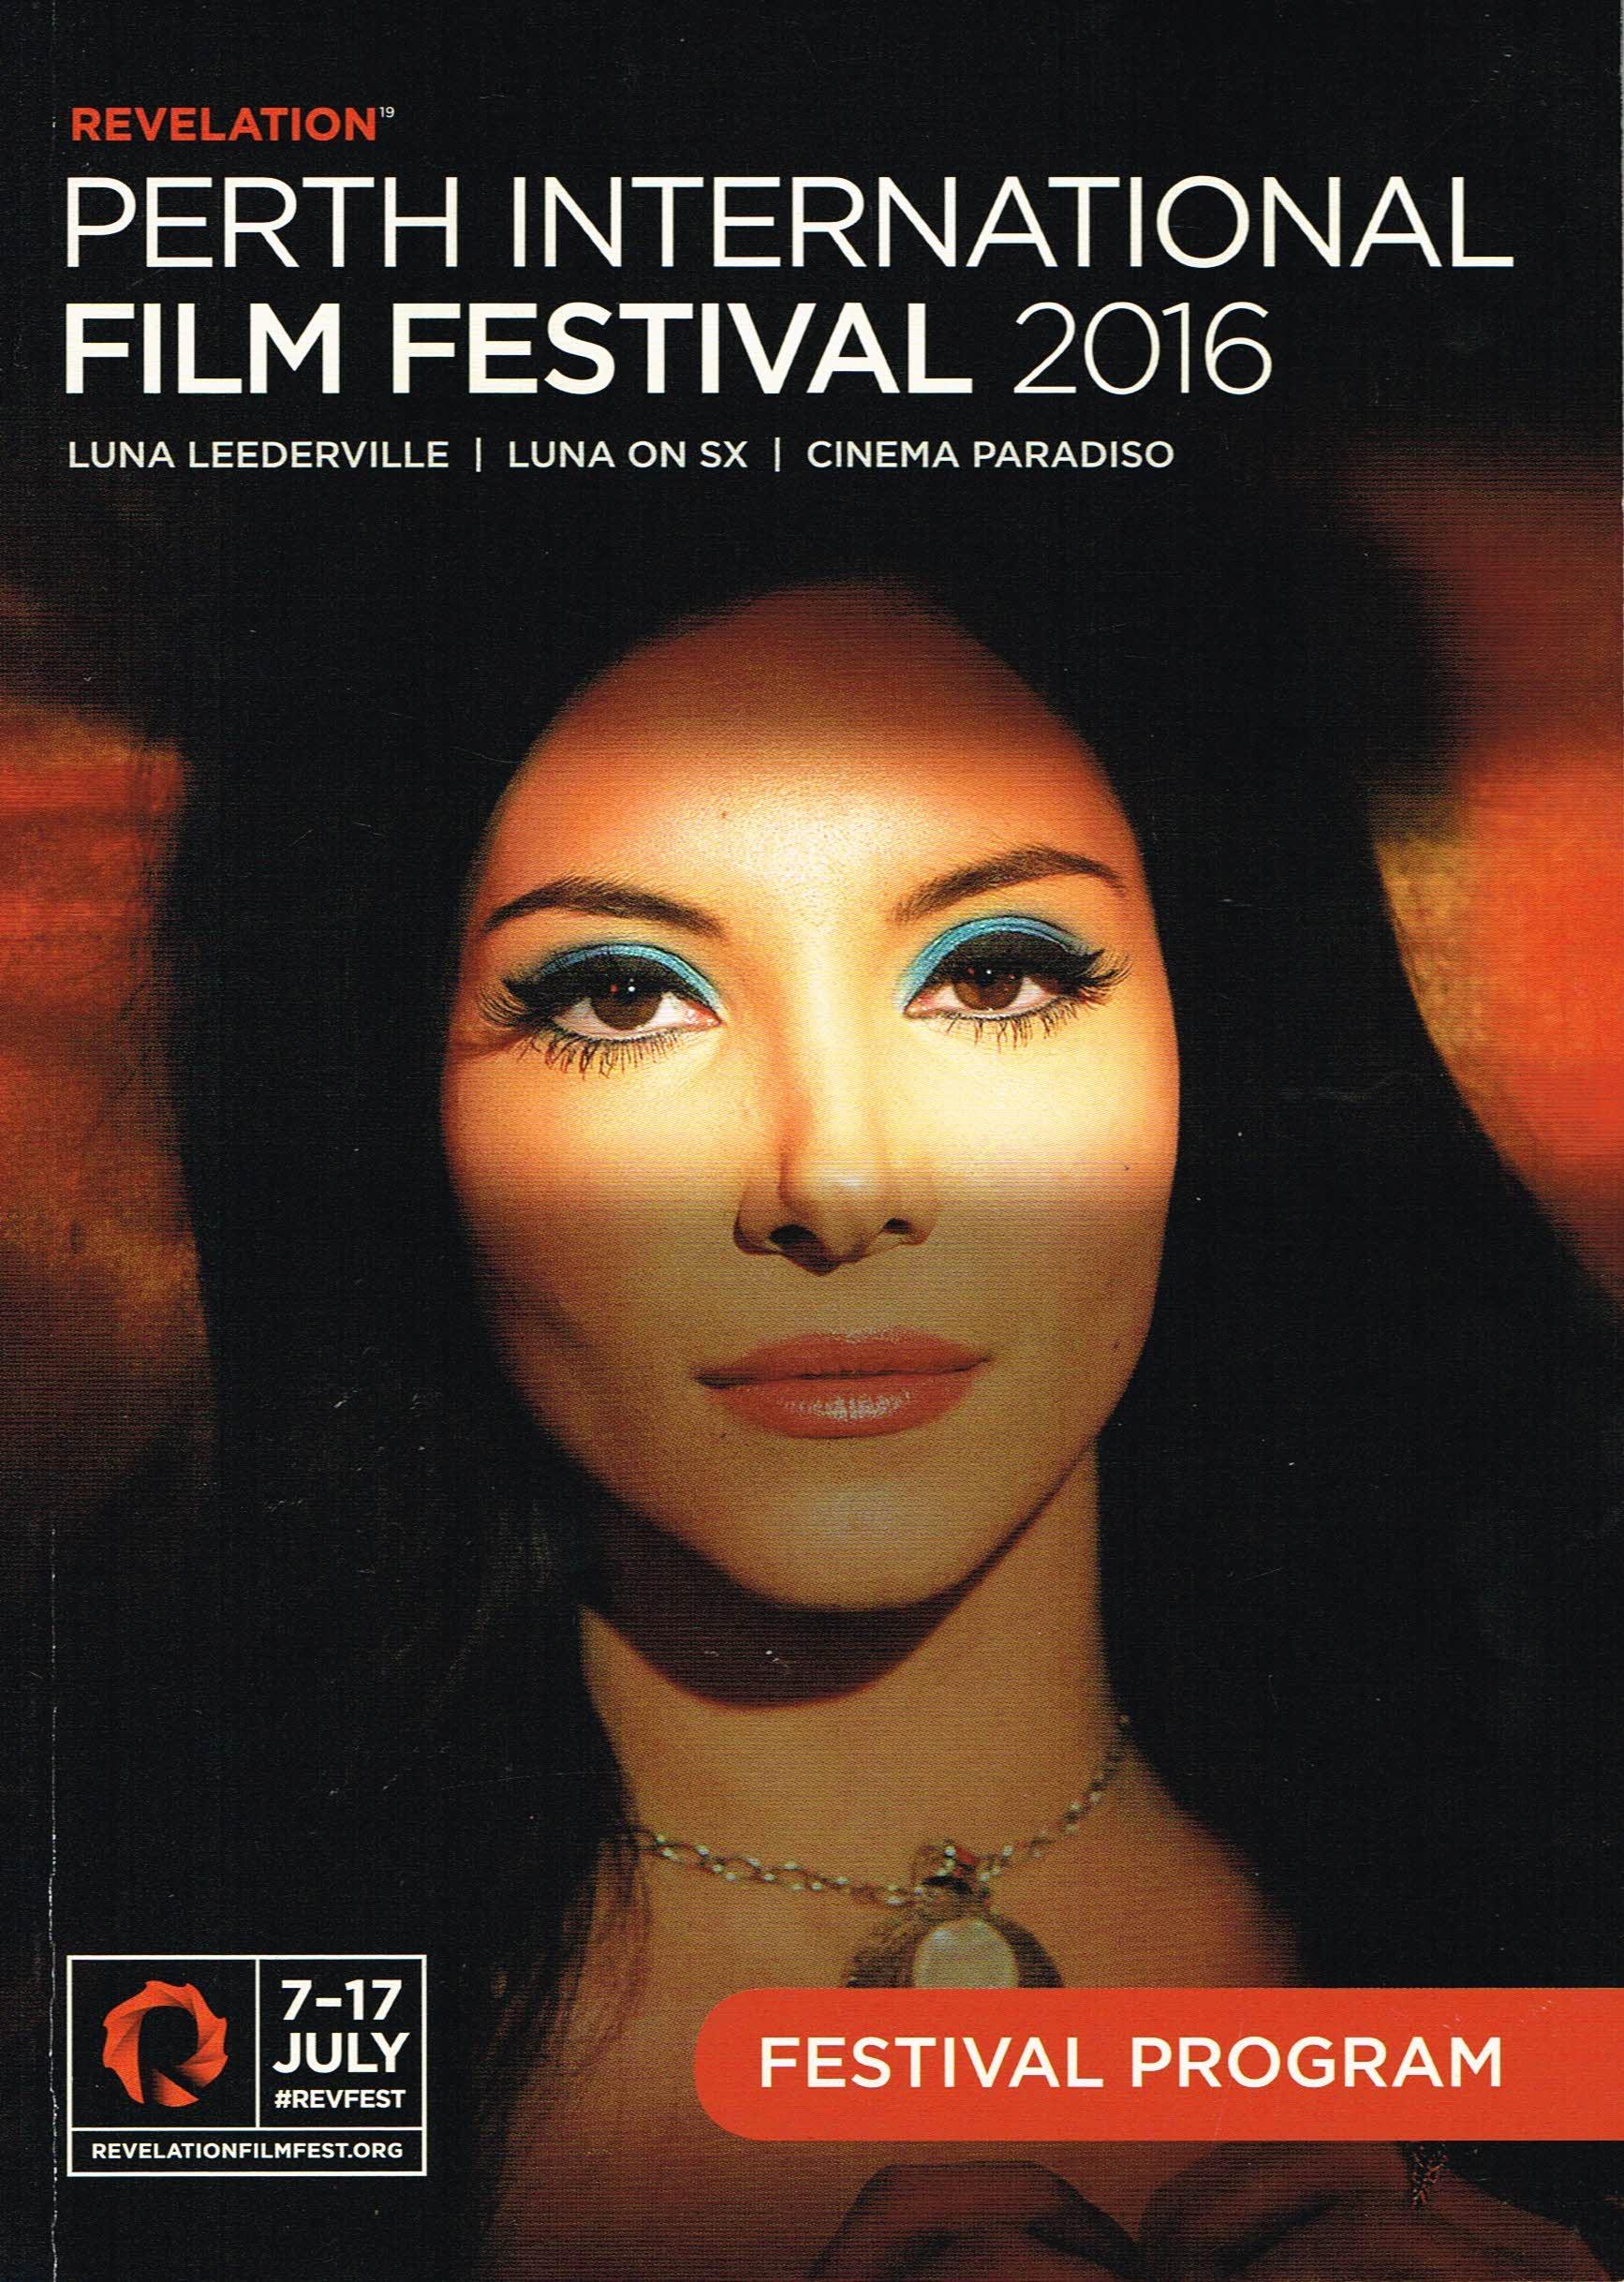 Perth+International+Film+Festival+2016.jpg